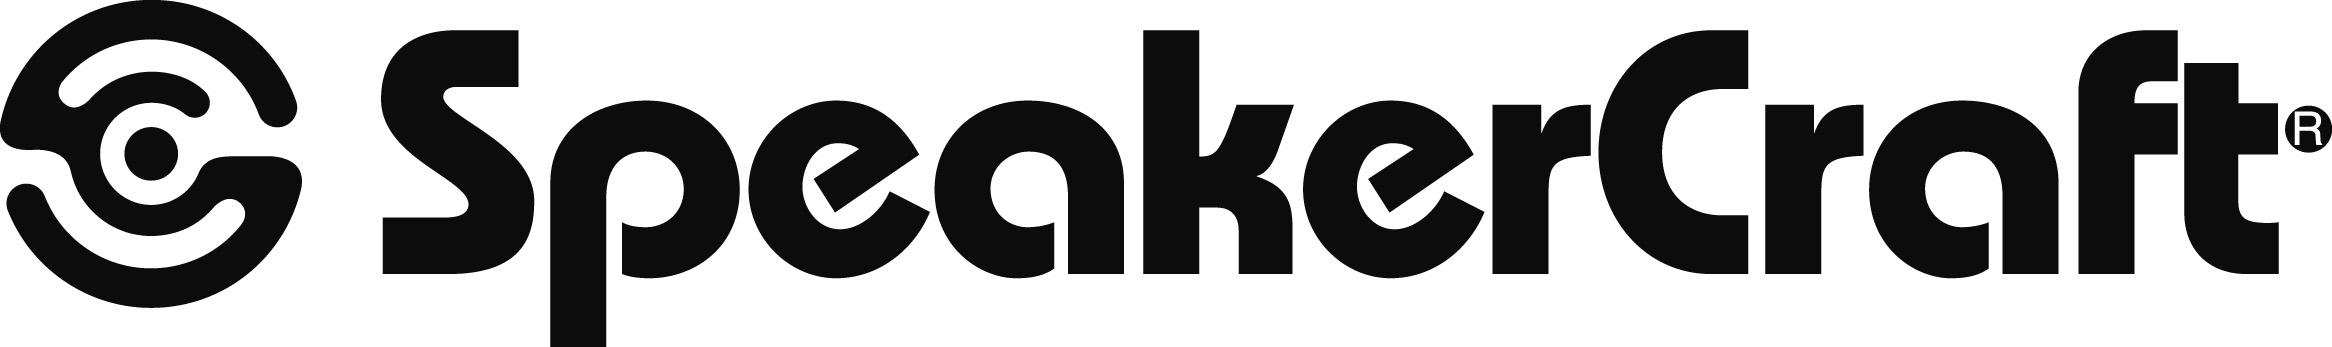 speakercraft.jpg